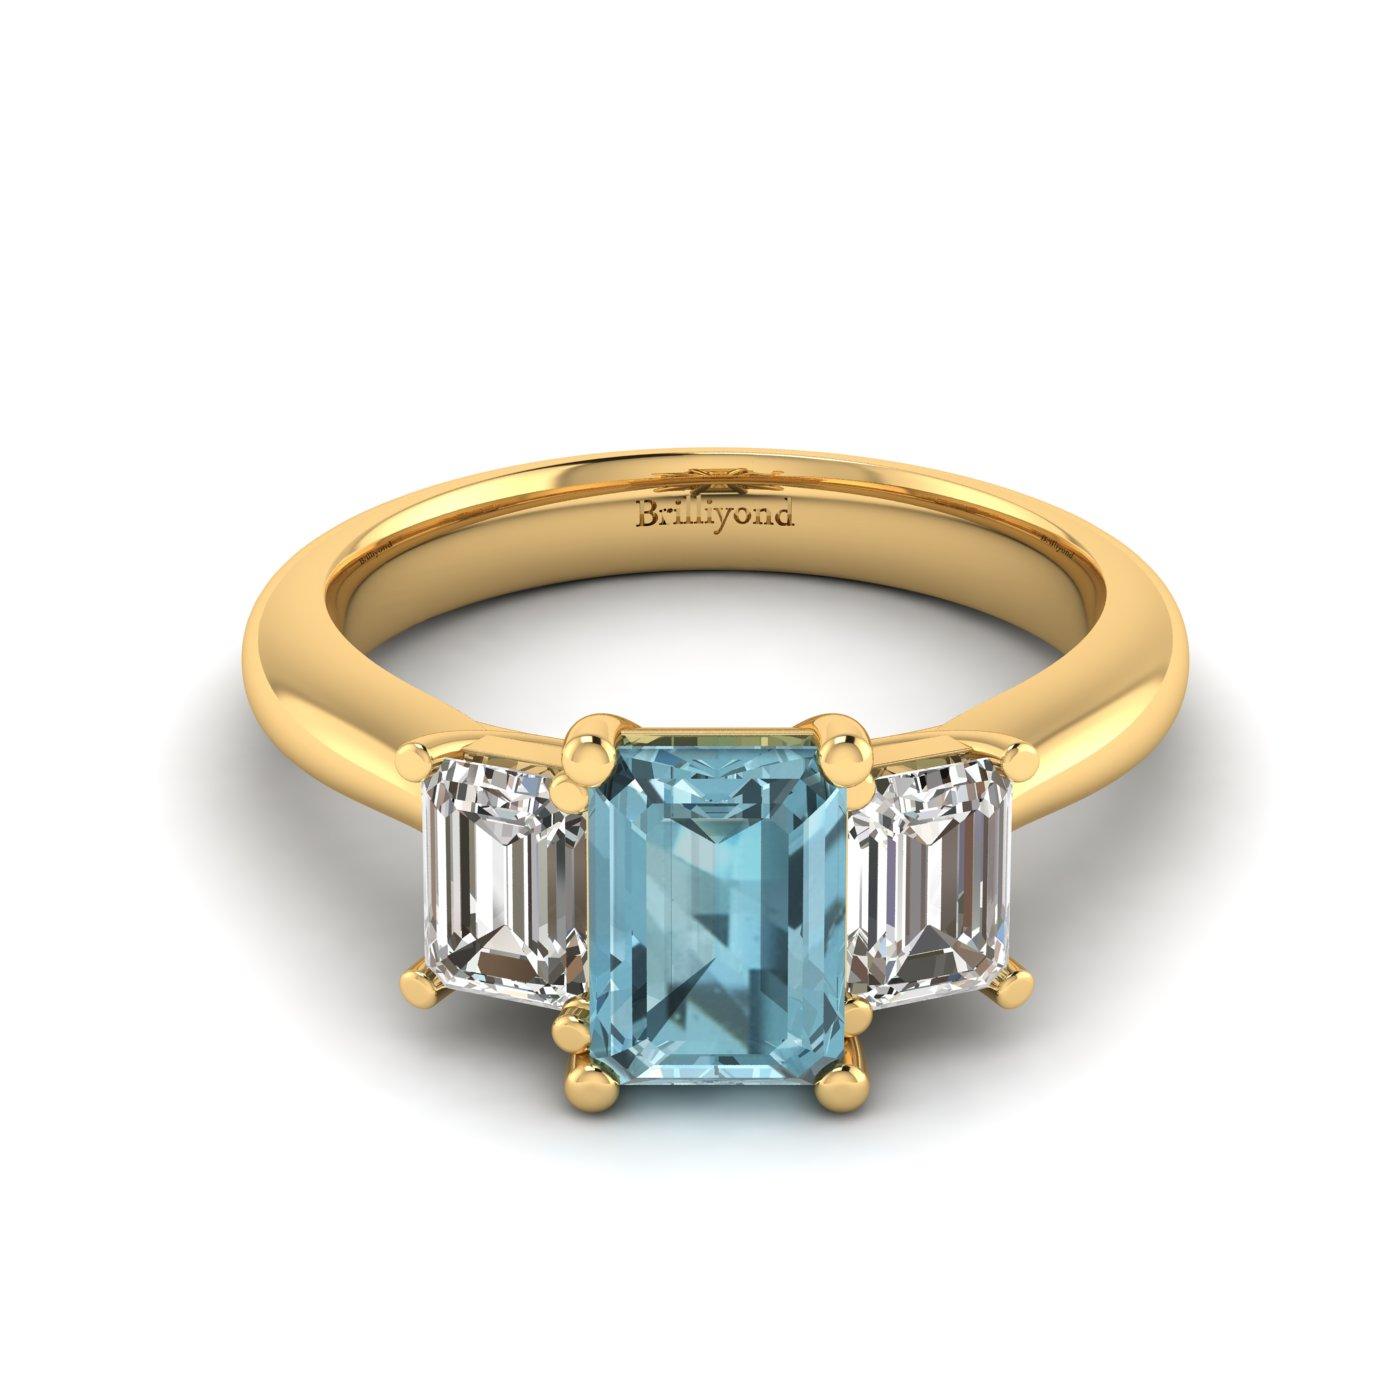 Aquamarine Yellow Gold Emerald Cut Engagement Ring Blanche_image2